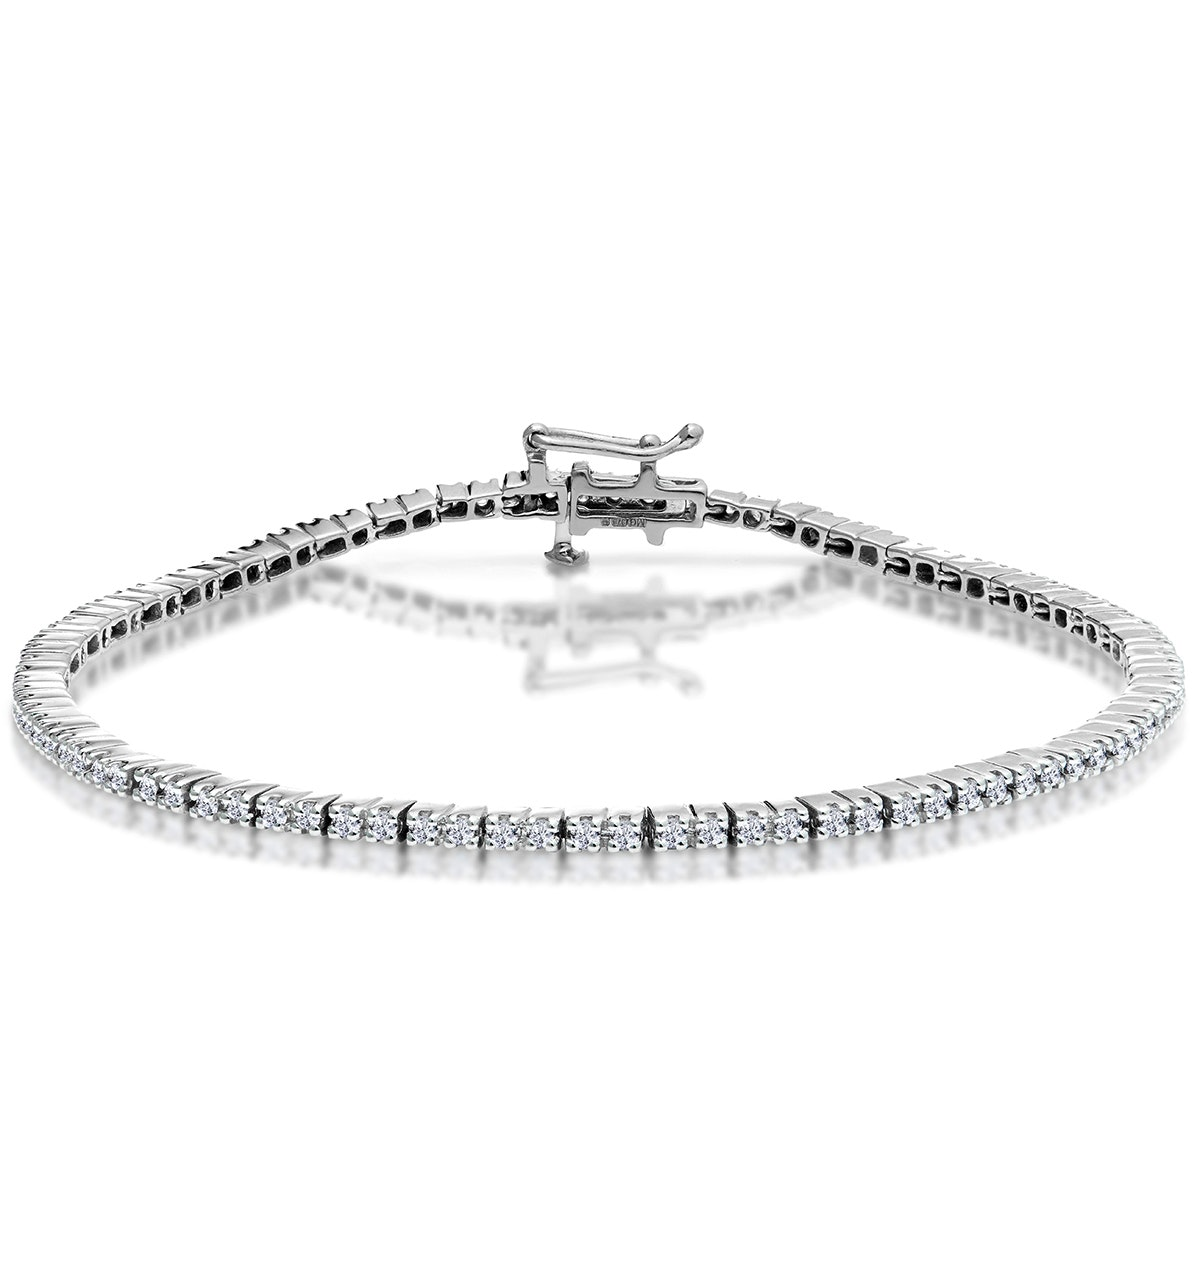 1ct Diamond Tennis Bracelet Claw Set in 9K White Gold